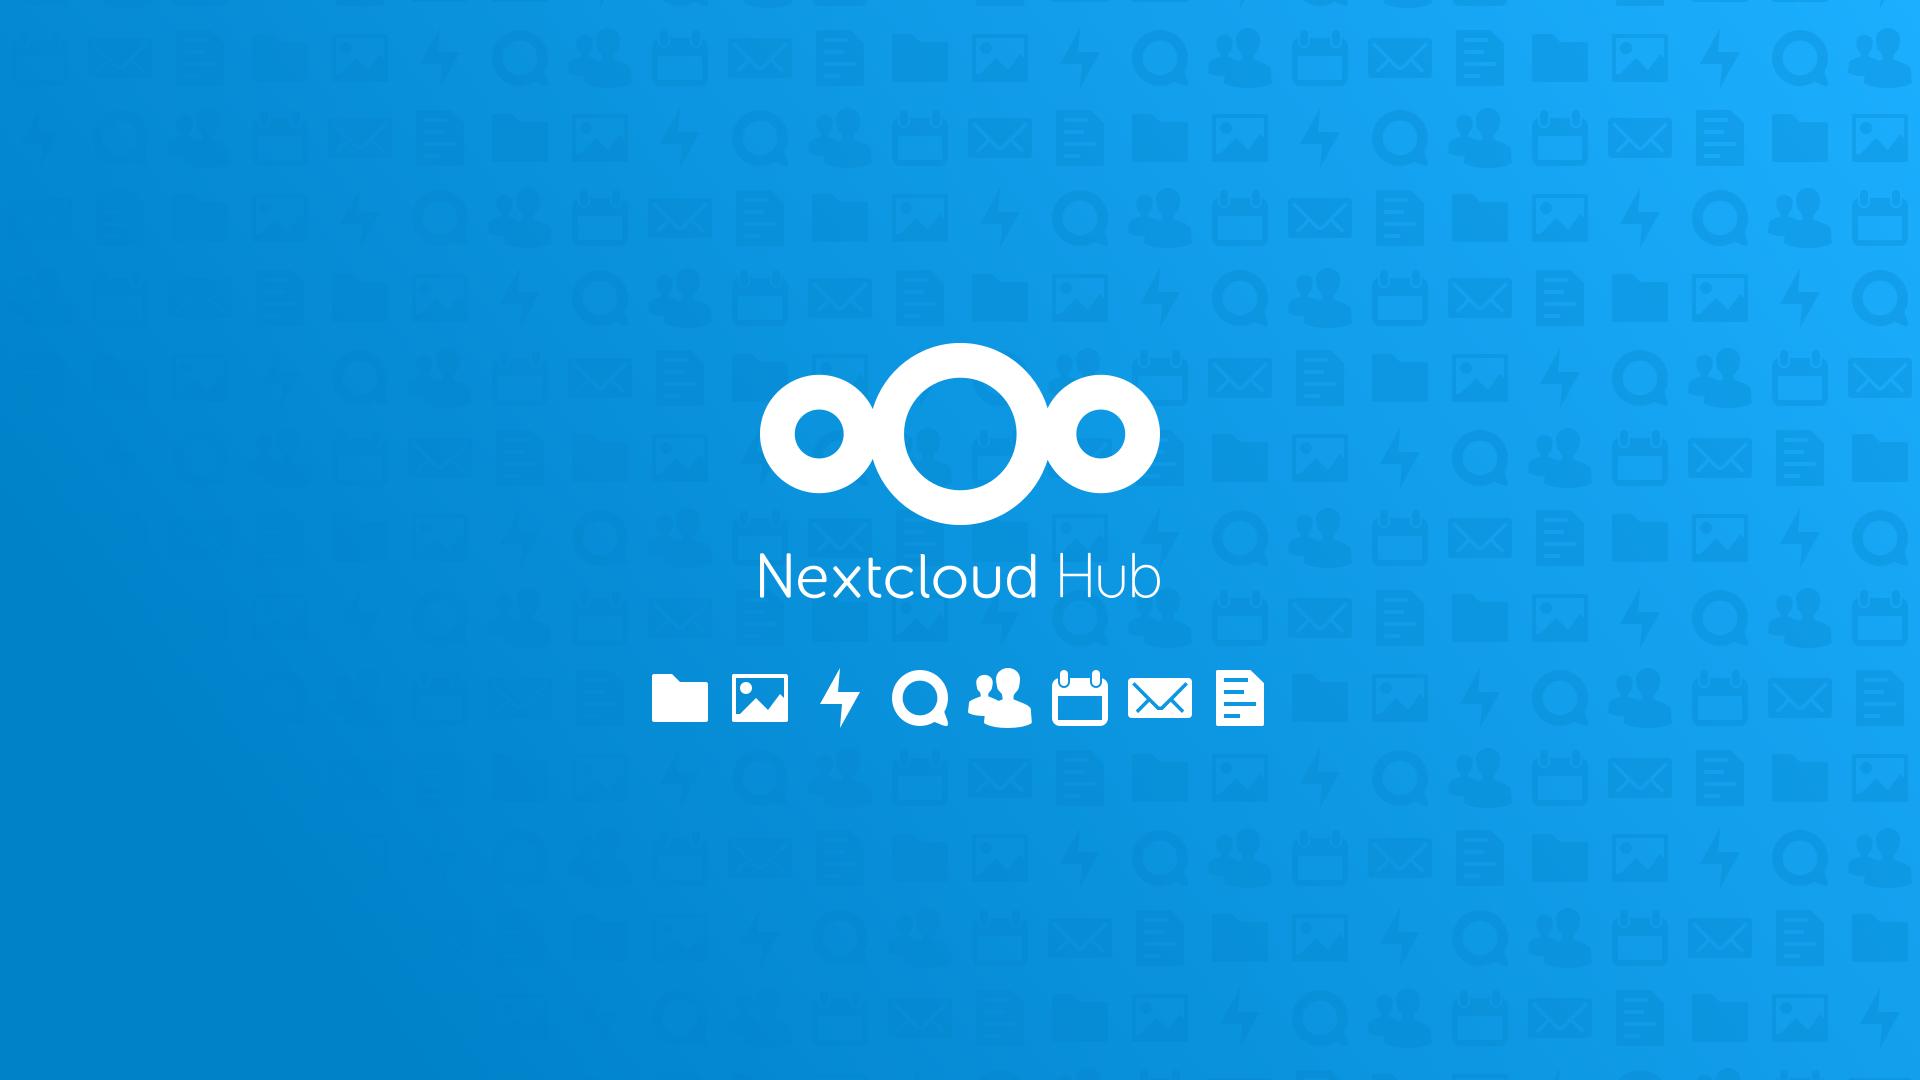 Nextcloud Hub logo